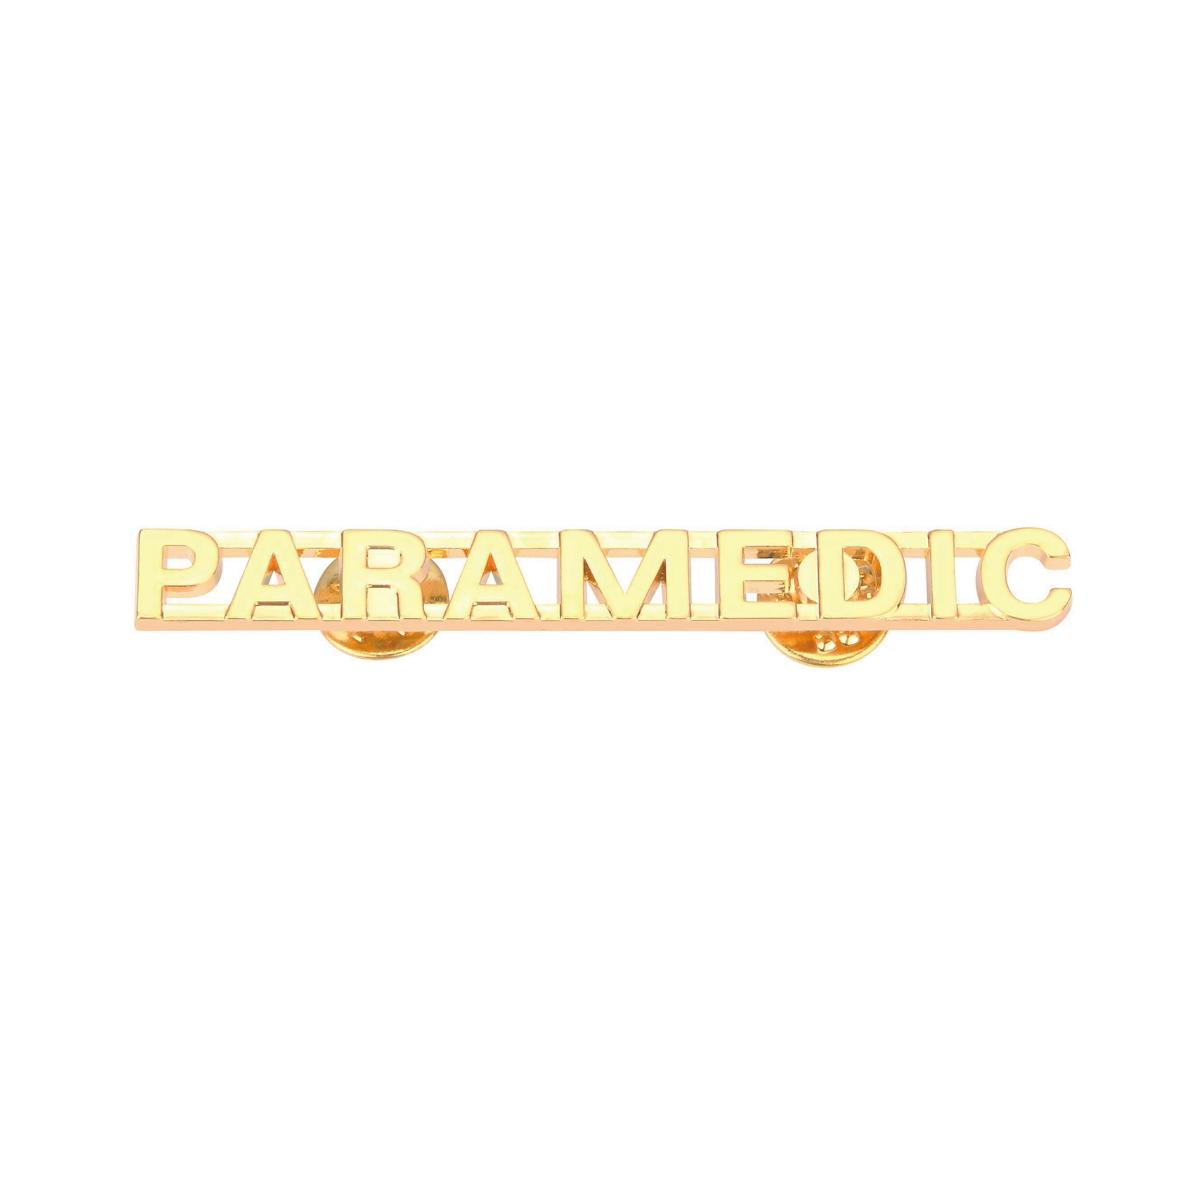 PARAMEDIC徽章